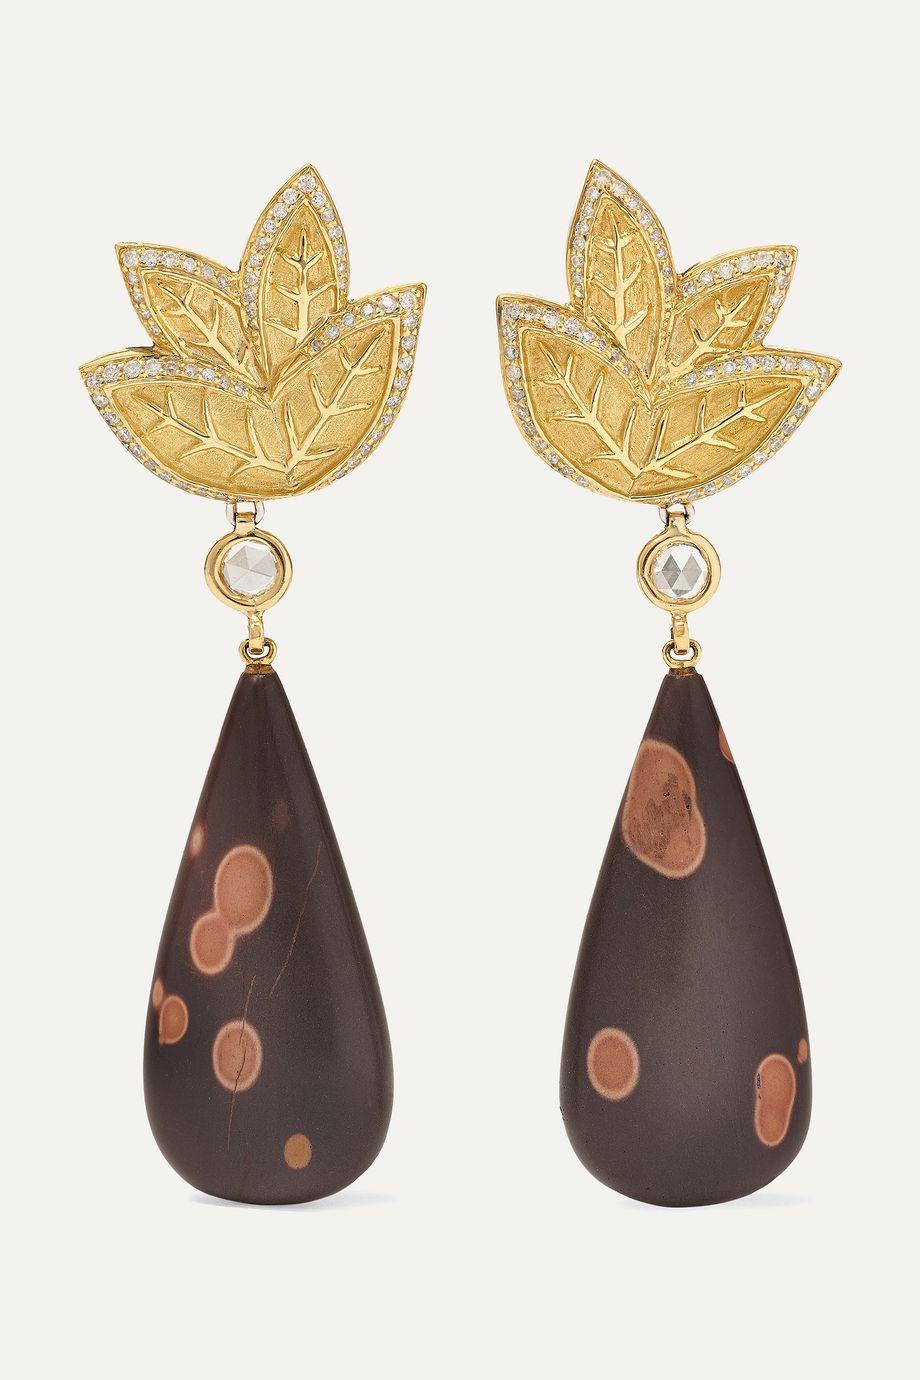 Kimberly McDonald + NET SUSTAIN 18-karat gold, astronomite and diamond earrings